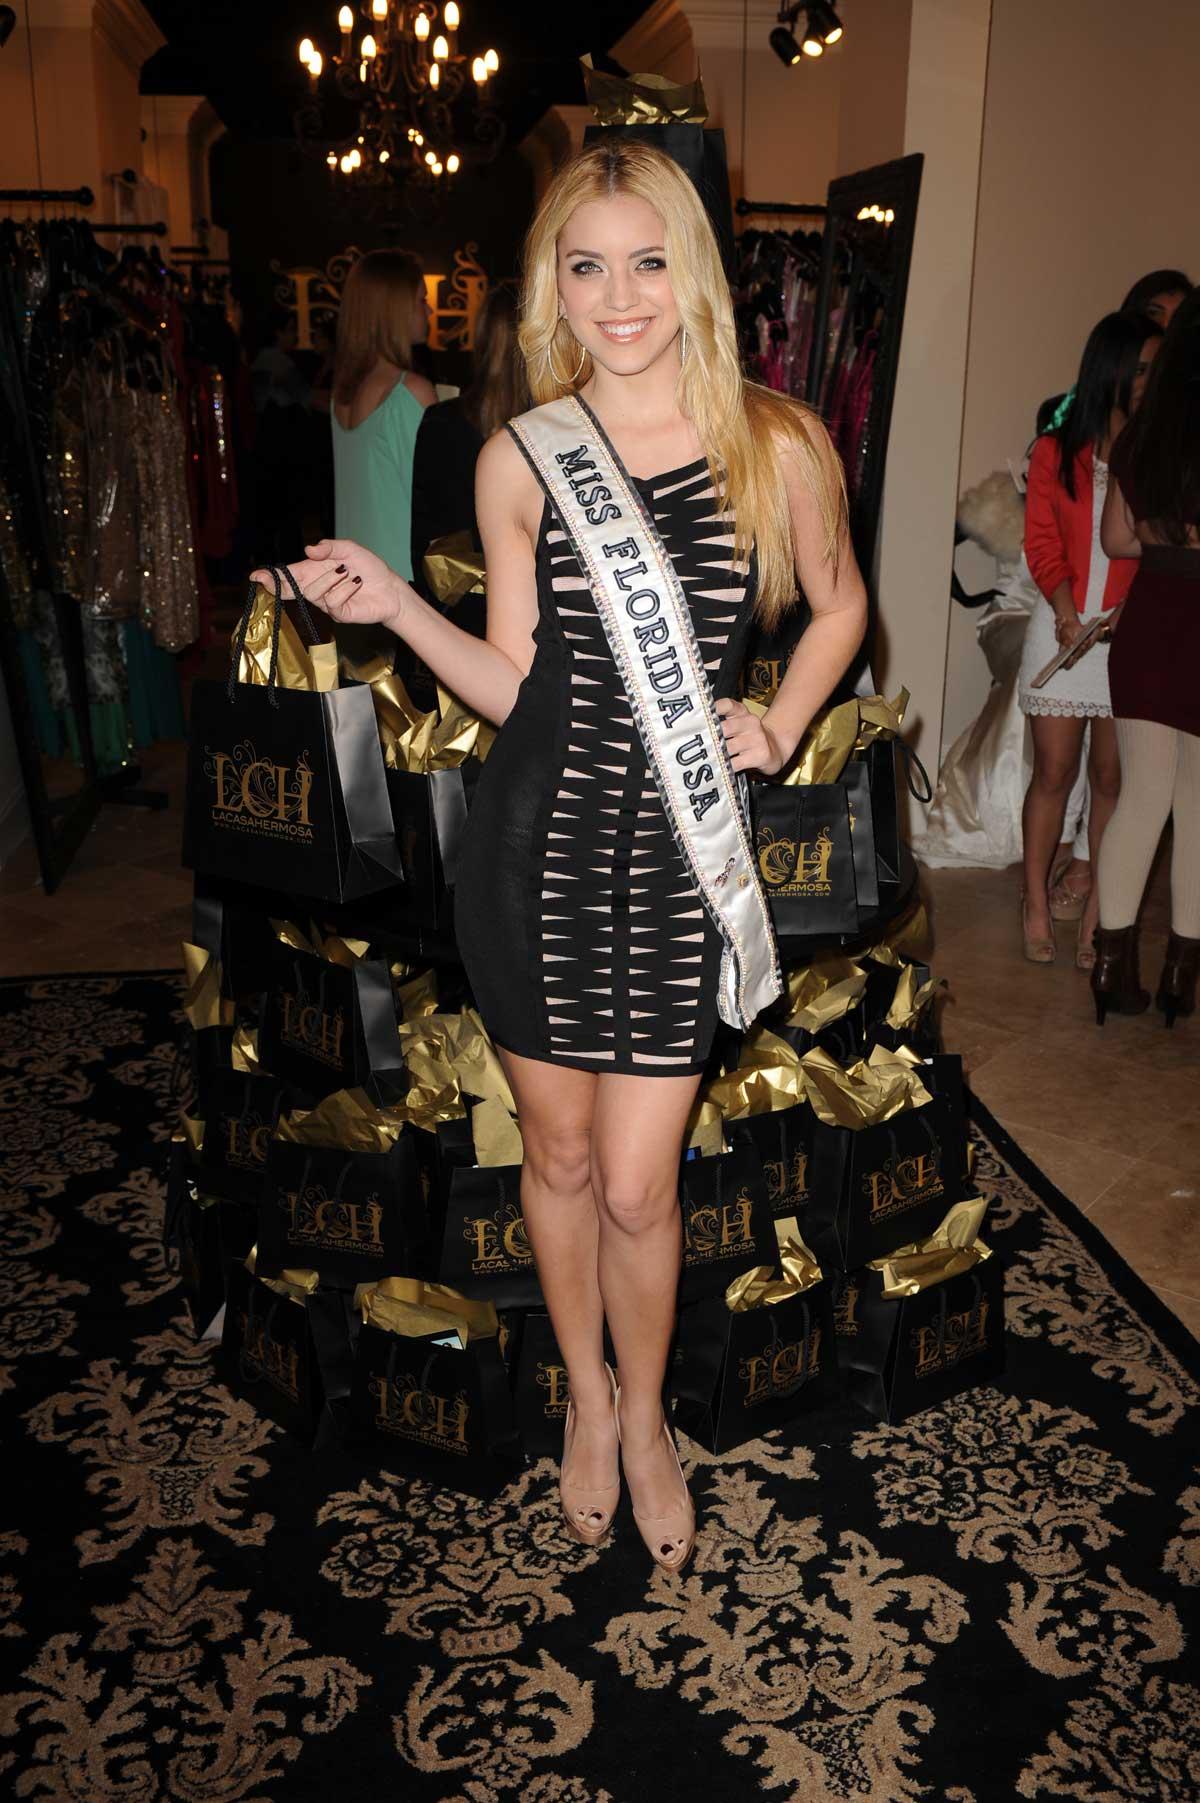 Miss Florida USA 2013 Michelle Aguirre